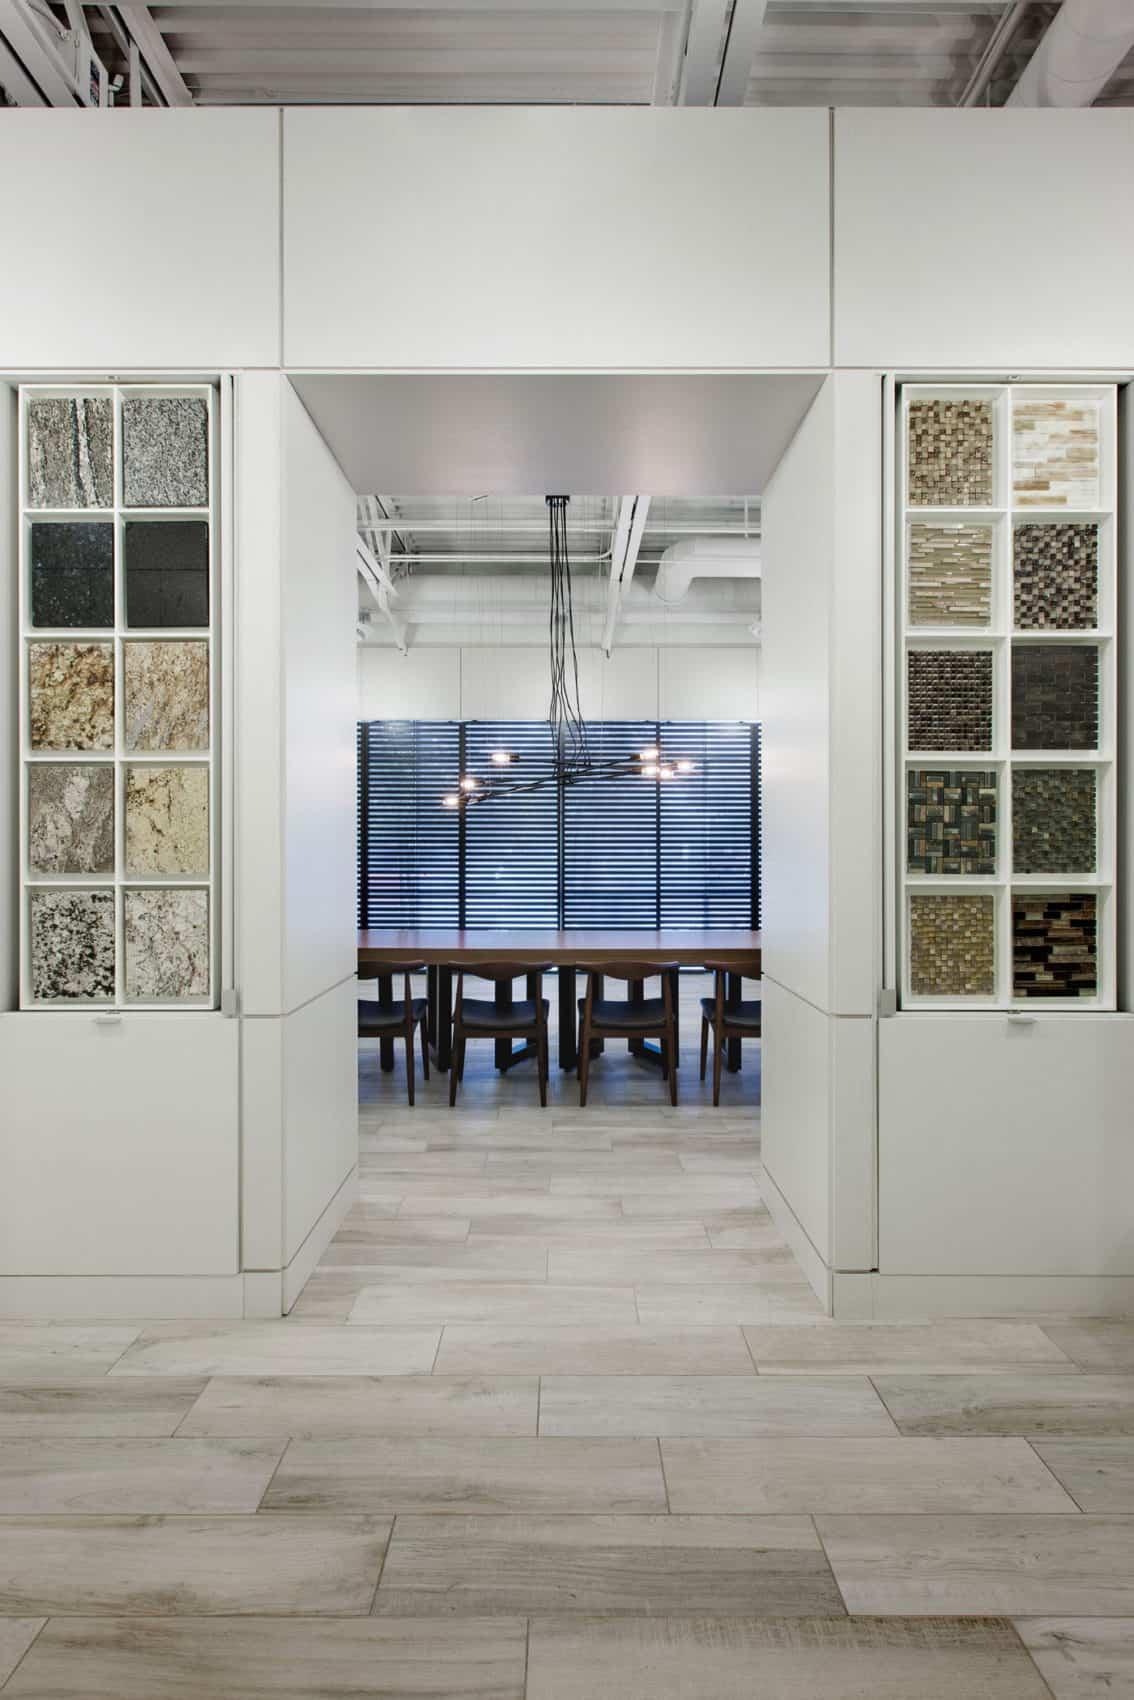 The Studio by Ashton Woods by Cecconi Simone (8)